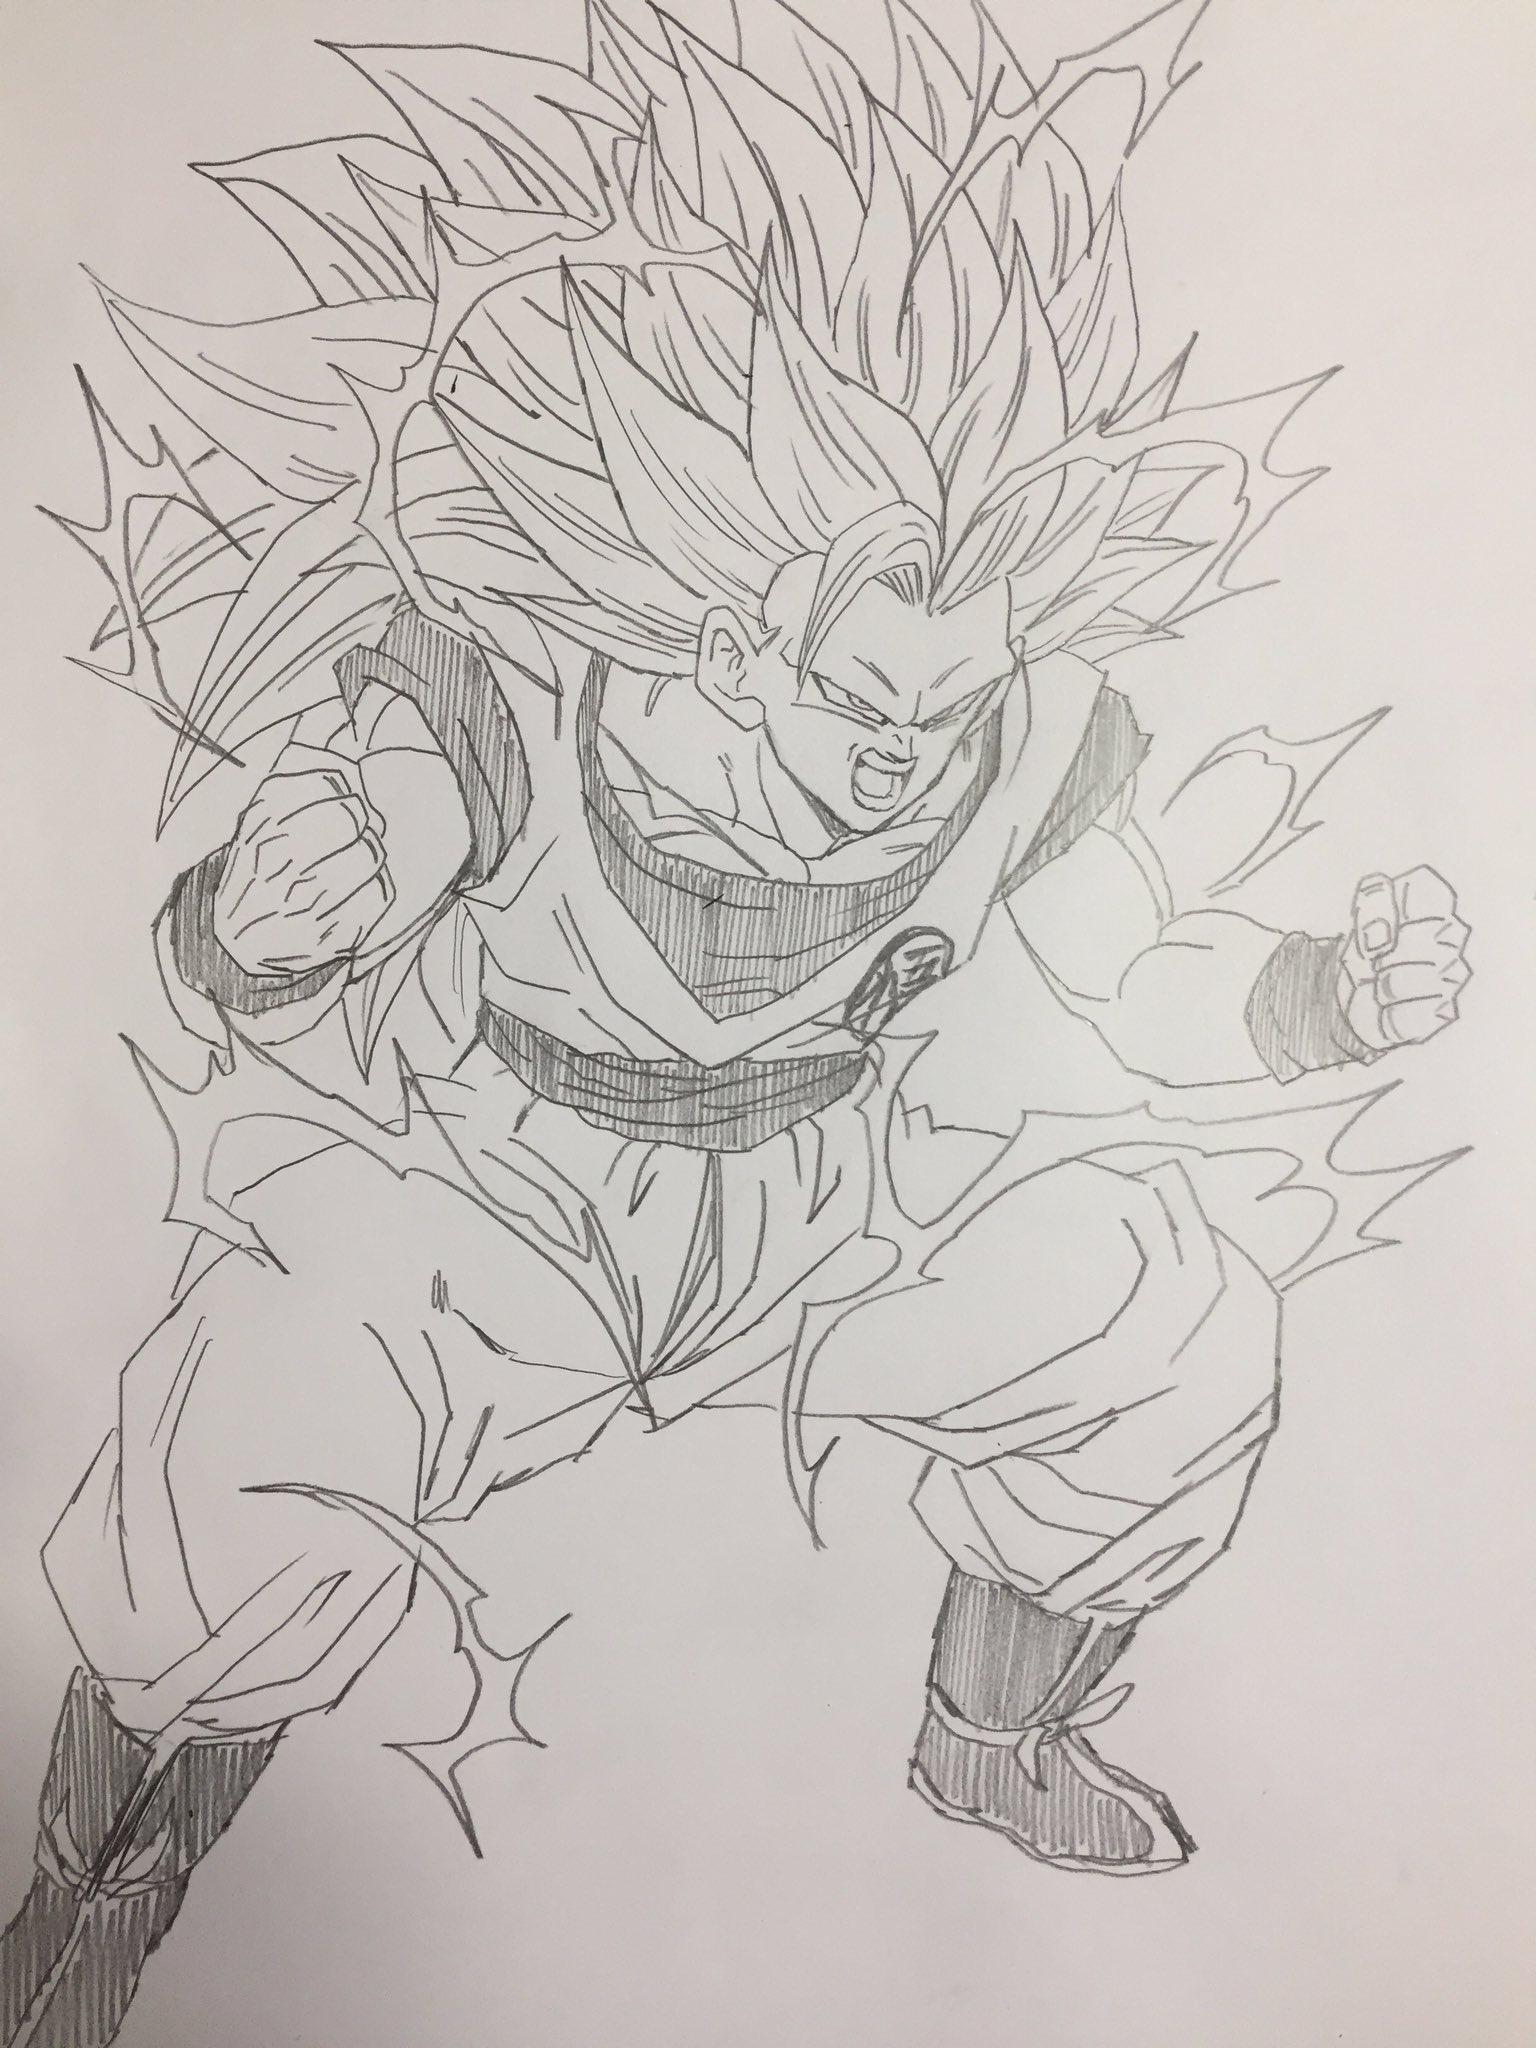 Dessin Son Goku Kakarotto Super Saiyajin 3 Dibujo De Goku Goku Dibujo A Lapiz Goku A Lapiz